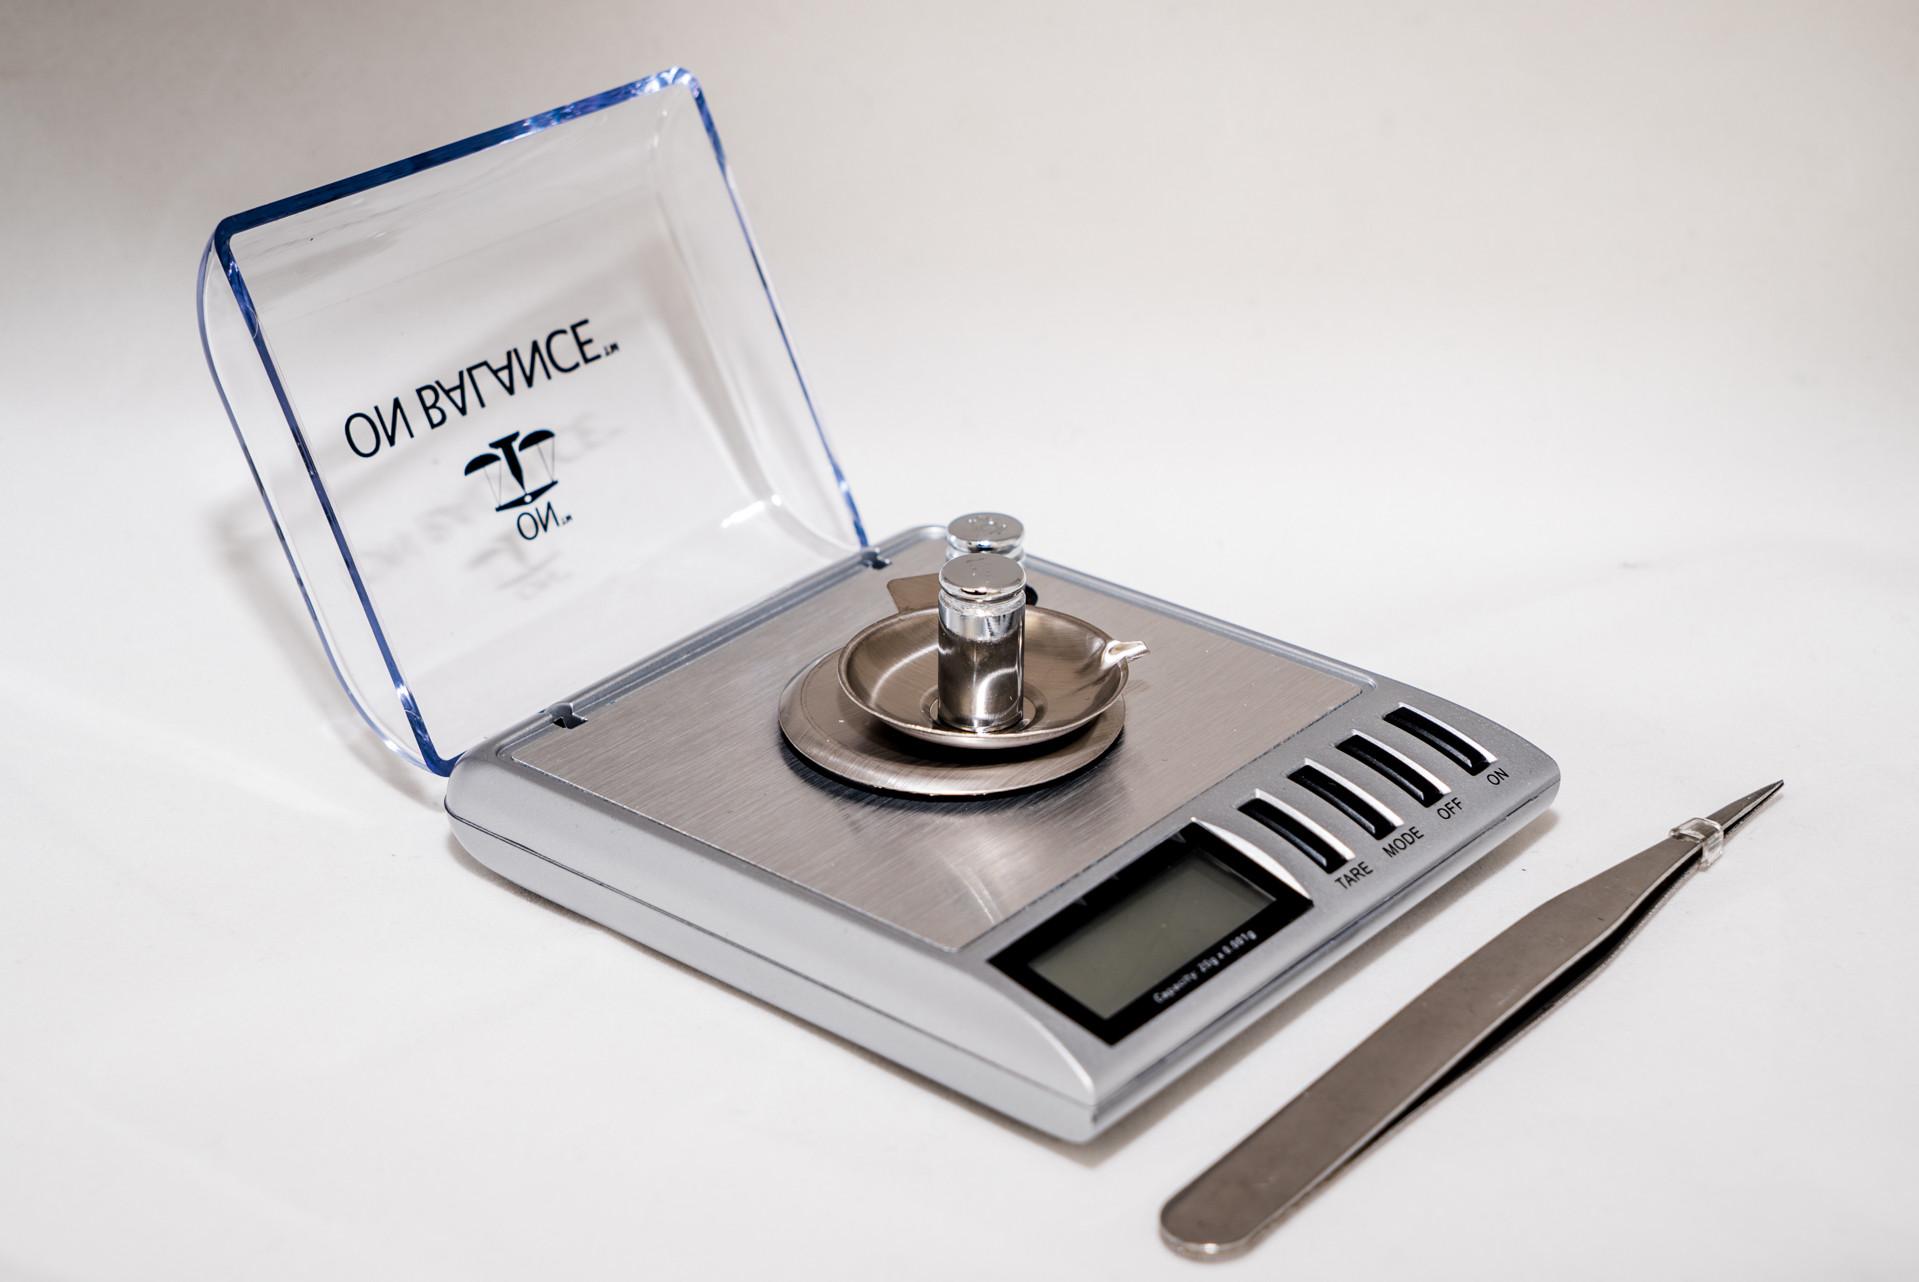 On Balance Carat Jewel Scale (Balanza de Joyas)(20g x 0.001g)